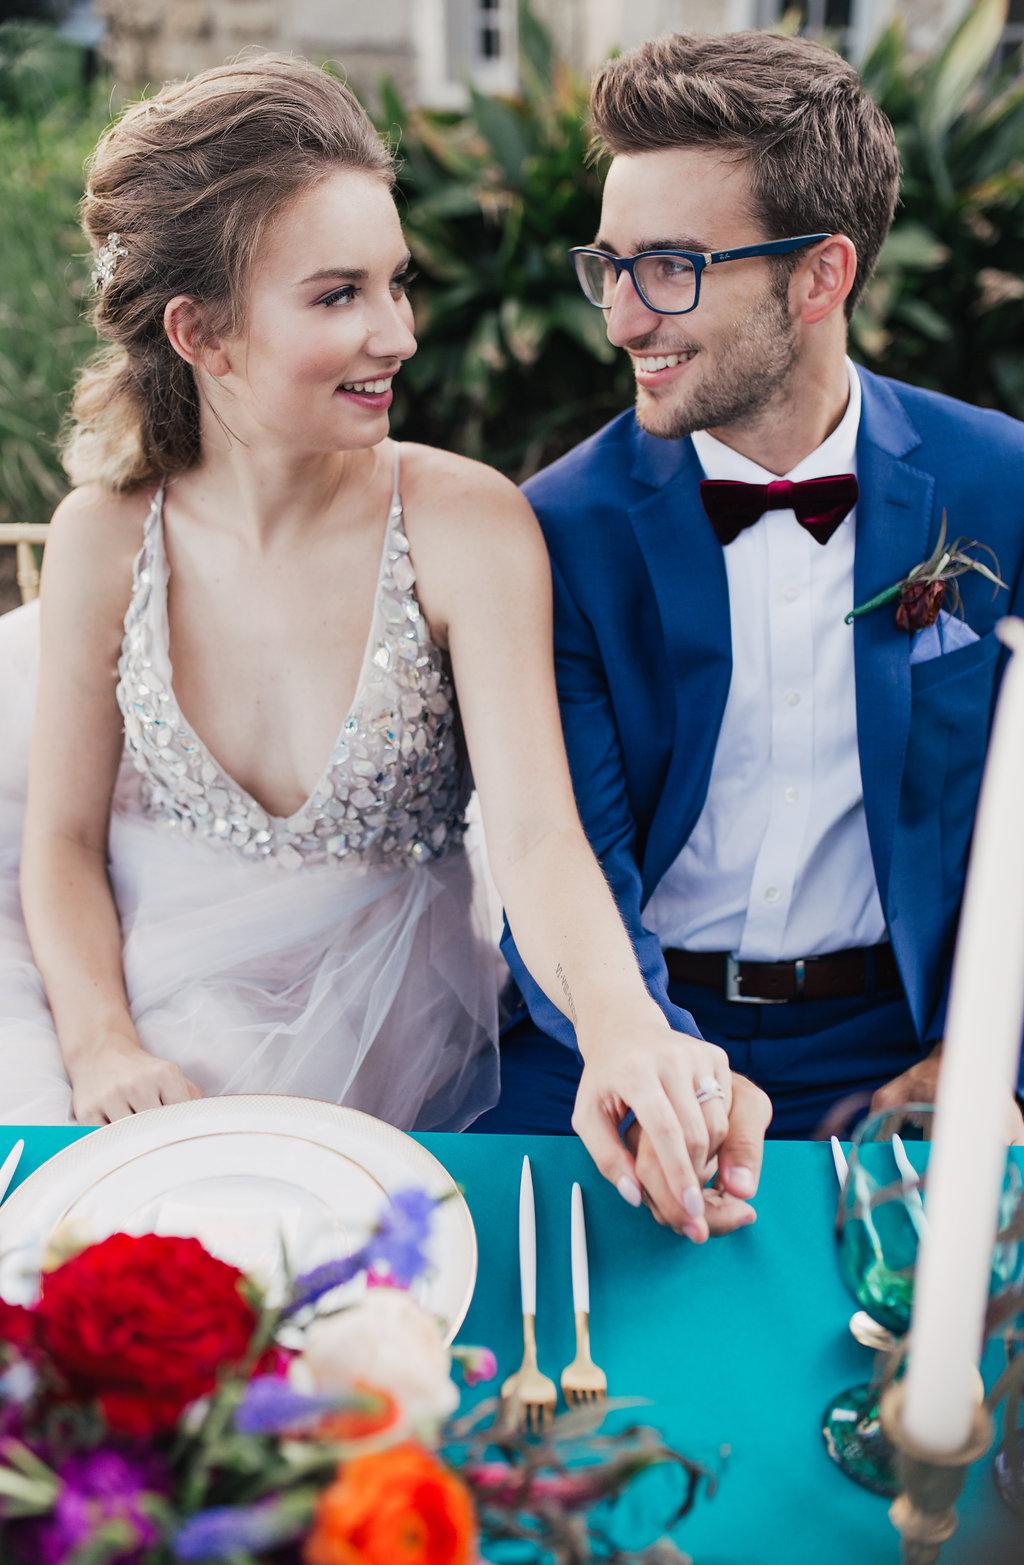 jewel toned wedding ideas - photo by Alondra Vega Photography http://ruffledblog.com/jewel-toned-wedding-ideas-with-a-surprise-proposal